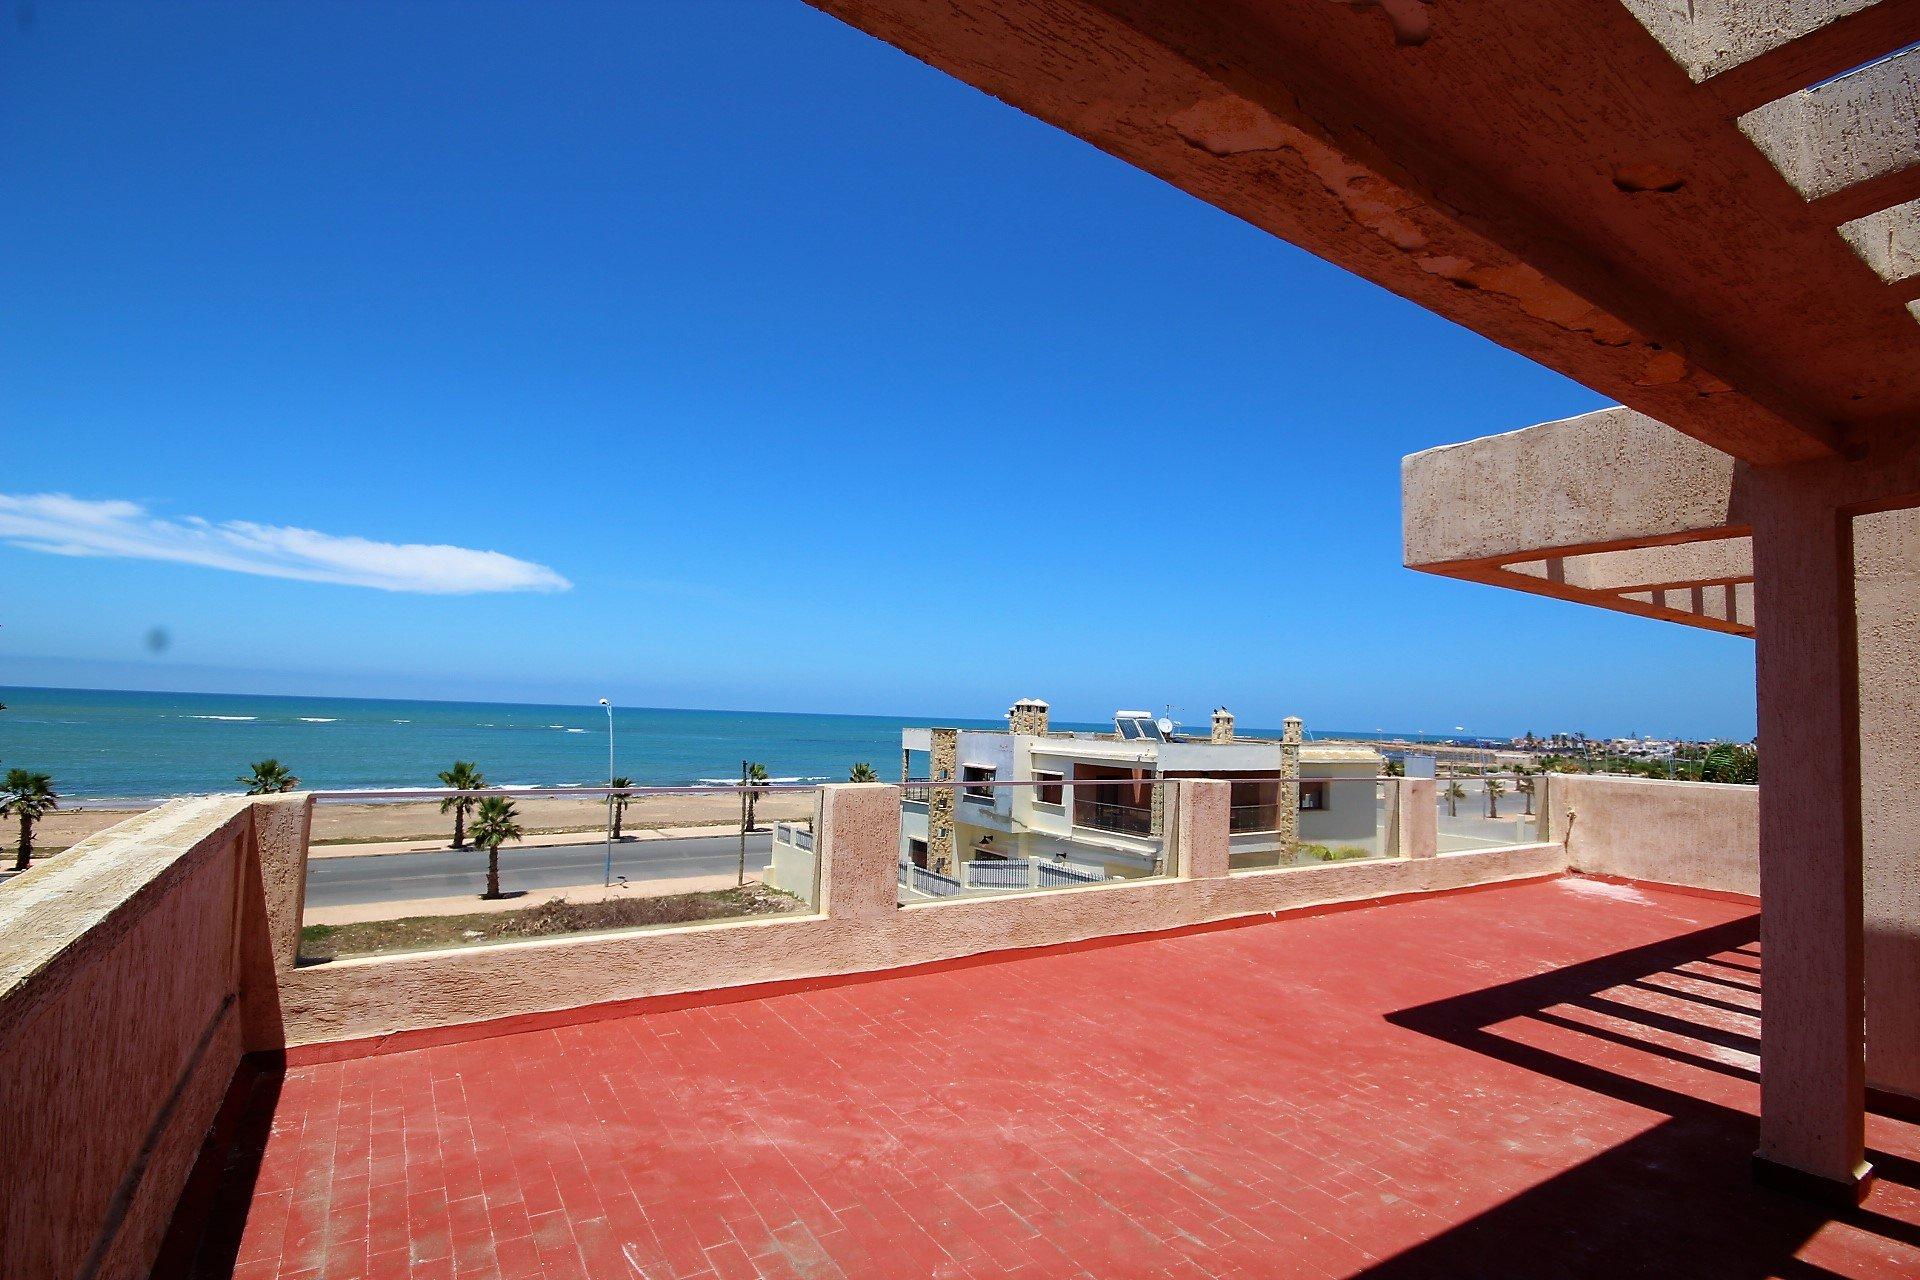 Maroc, Dar Bouazza, à acheter villa moderne piscine, vue mer, vendue a très Bon prix